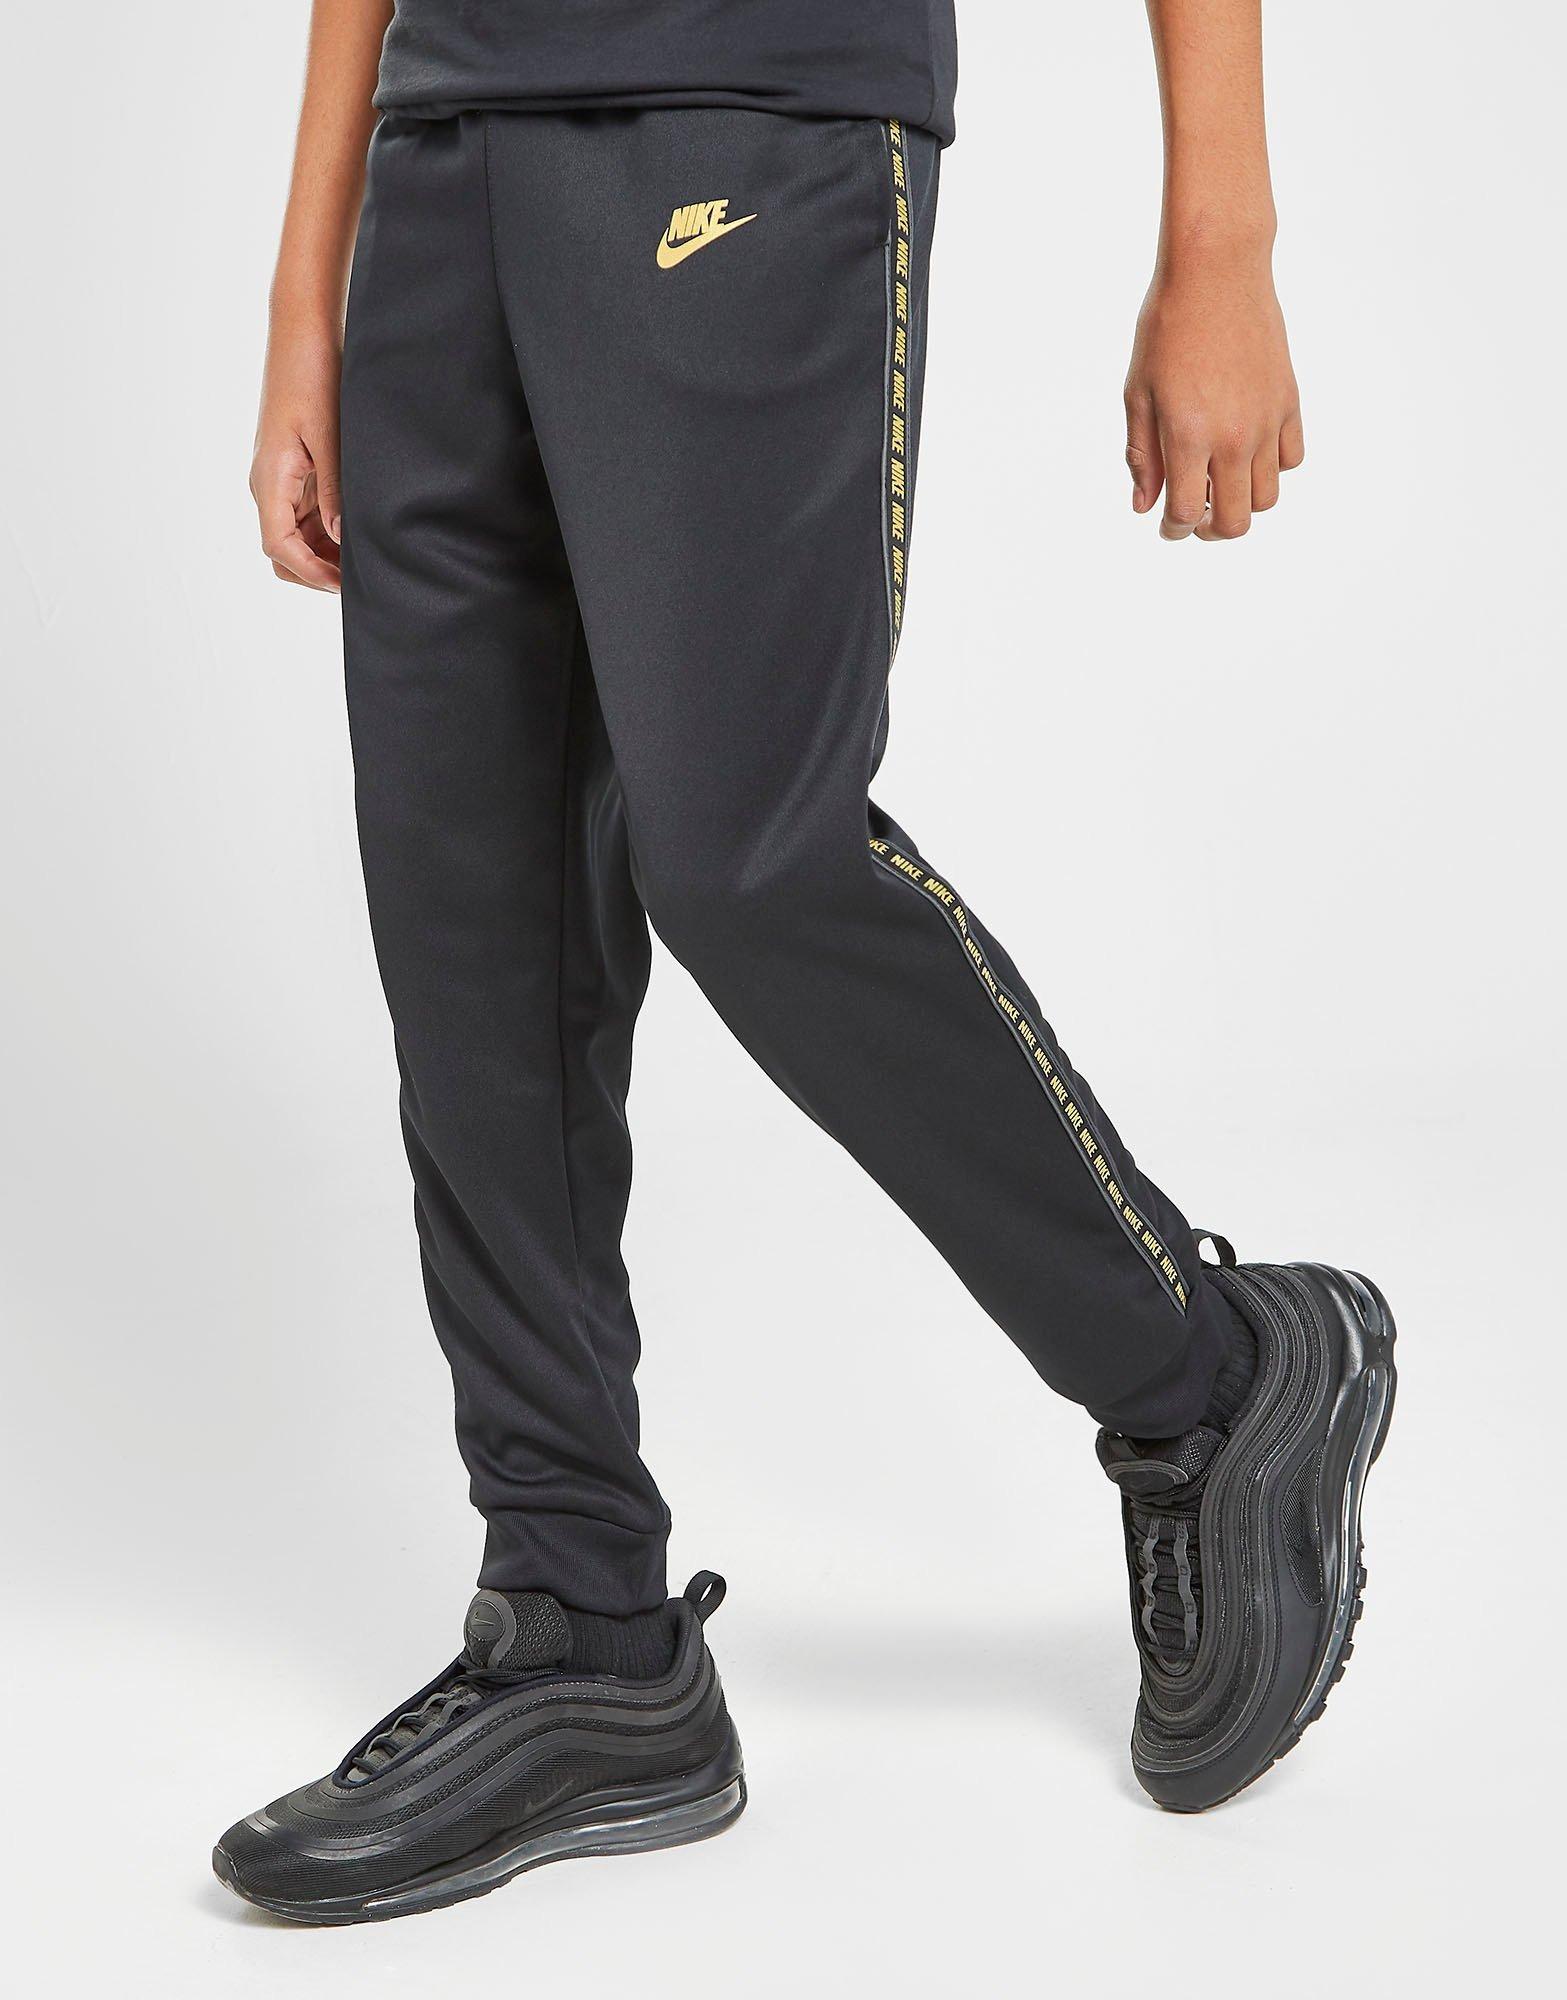 emparedado explotar Ejemplo  Buy Nike Tape Poly Track Pants Junior | JD Sports